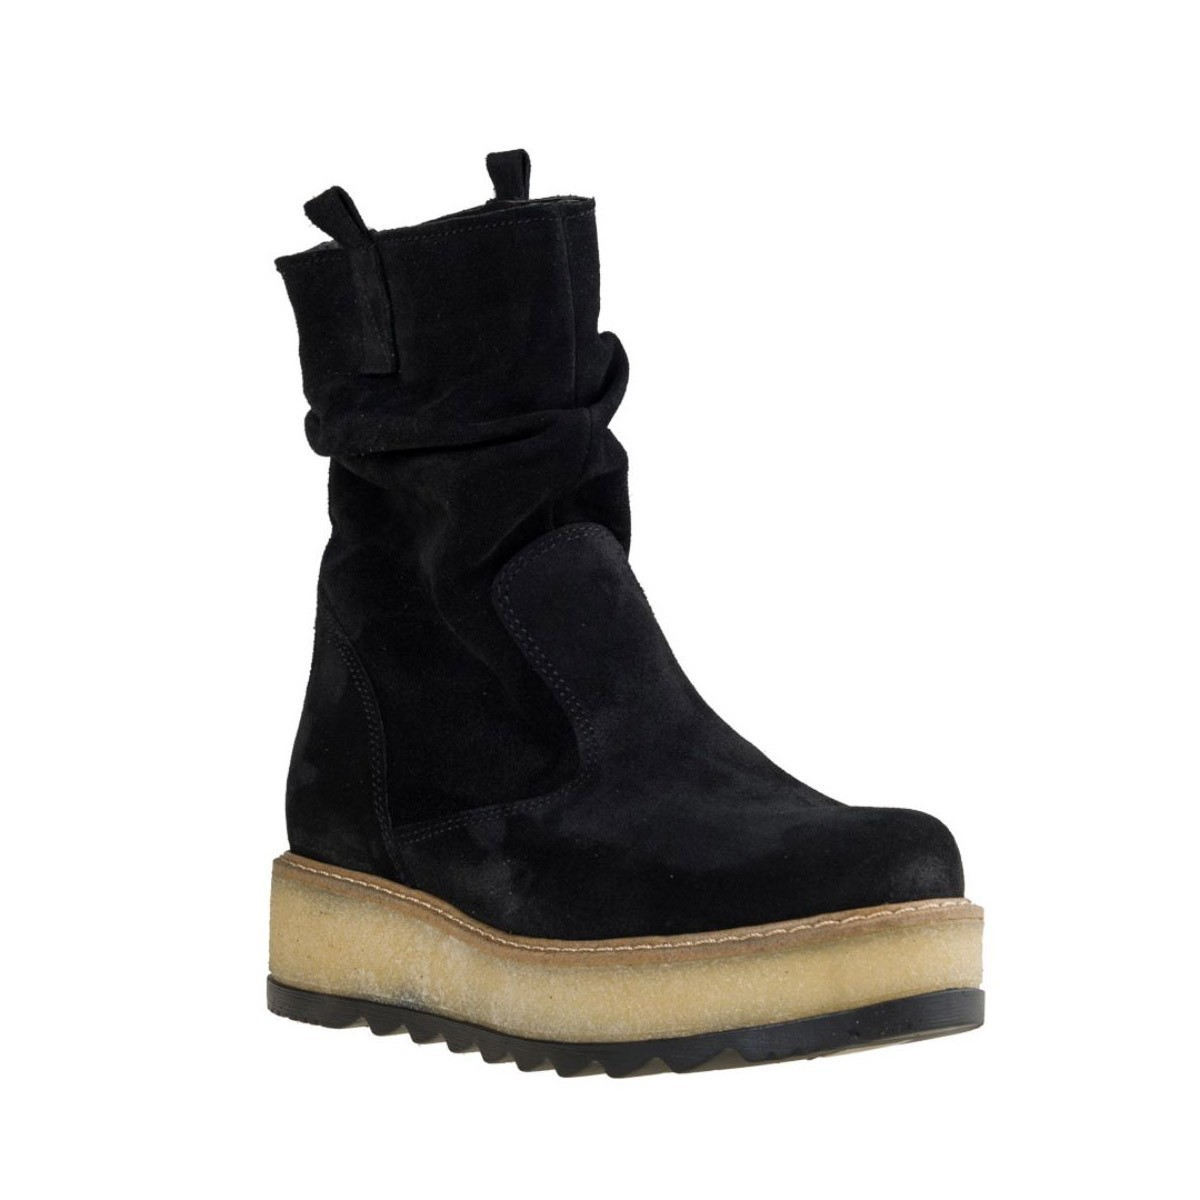 Fashion Icon Γυναικεία Παπούτσια Μποτάκια 09-358 Μαύρο